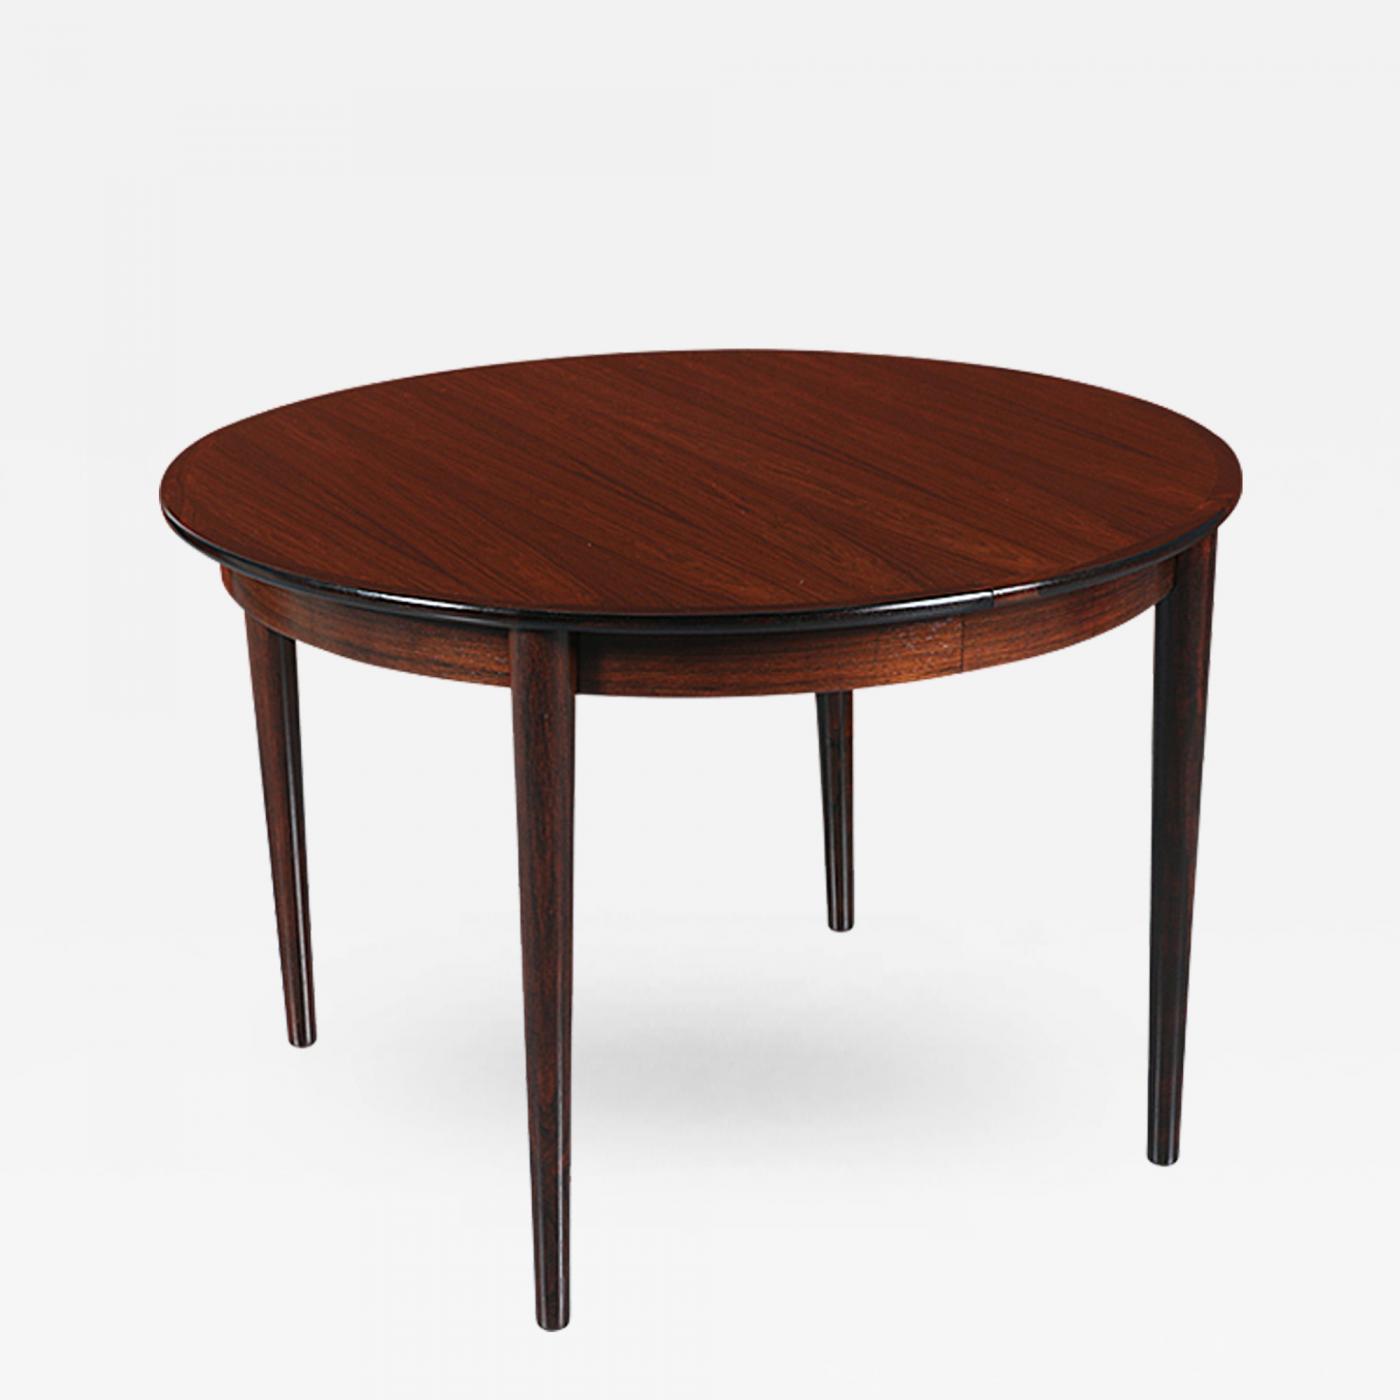 Danish Modern Rosewood Dining Table : Danish Modern Rosewood Dining Table 188436 319826 from www.incollect.com size 1400 x 1400 jpeg 71kB